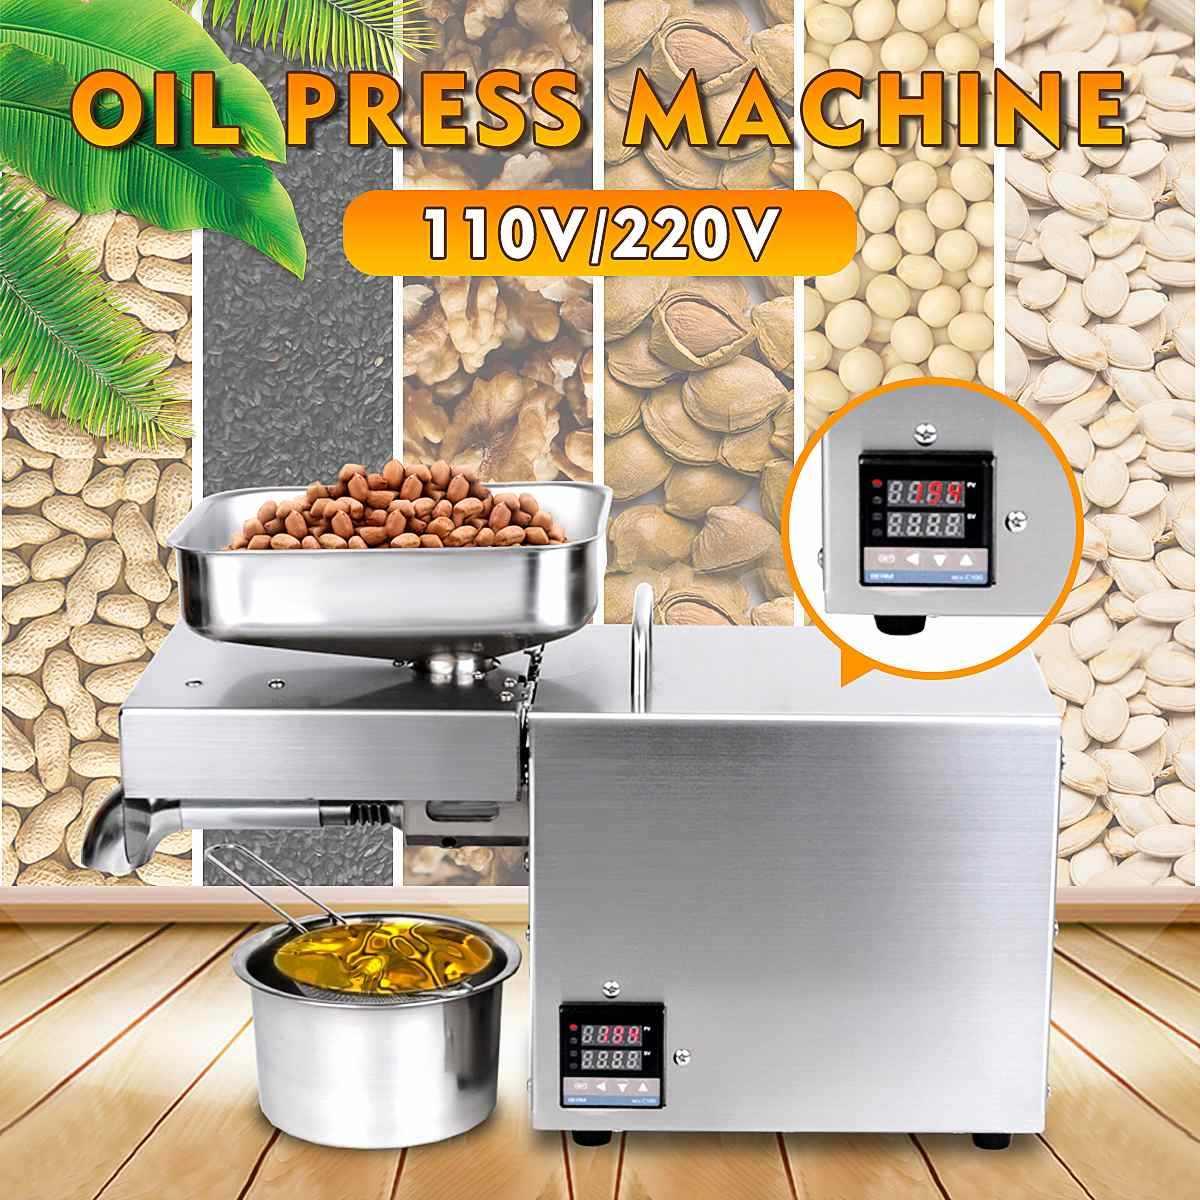 1500W Automatische Olie Persmachine Rvs Led Digitale Temperatuurregeling Peanutss Sesam Moer Olie Extractor Eu/Us plug